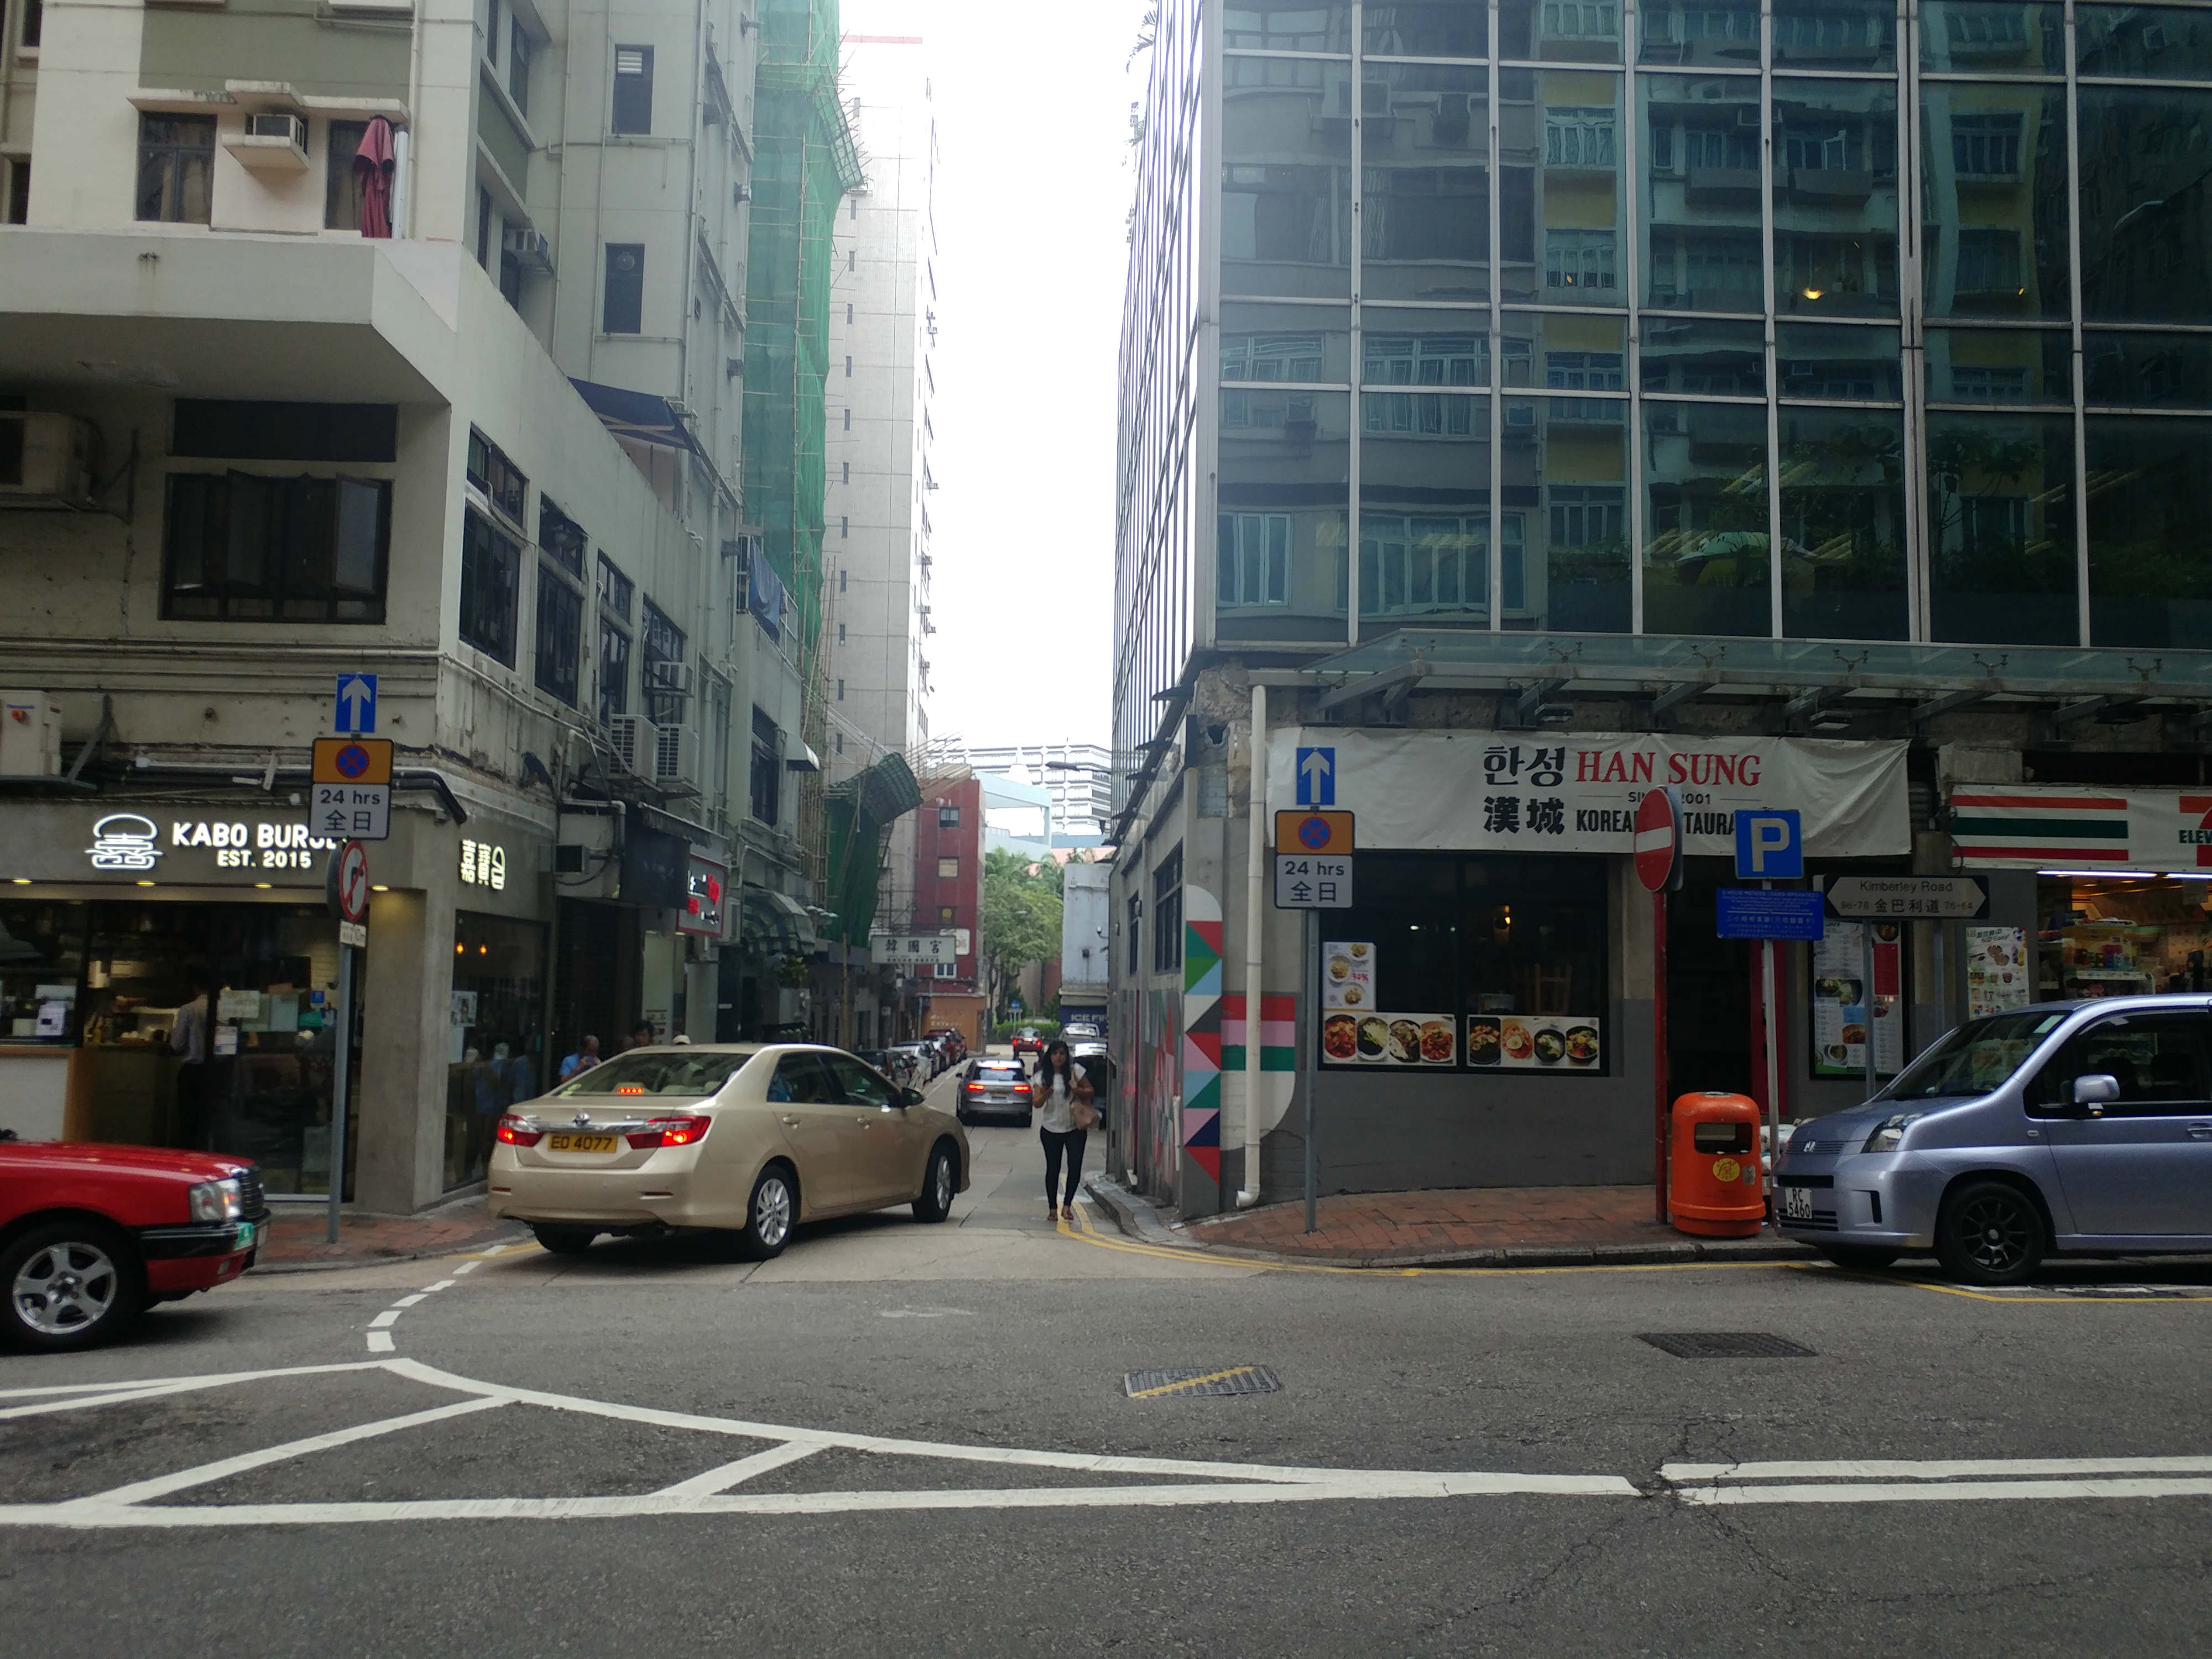 FB Shop to let near Kimberly Road, Tsim Sha Tsui in HK